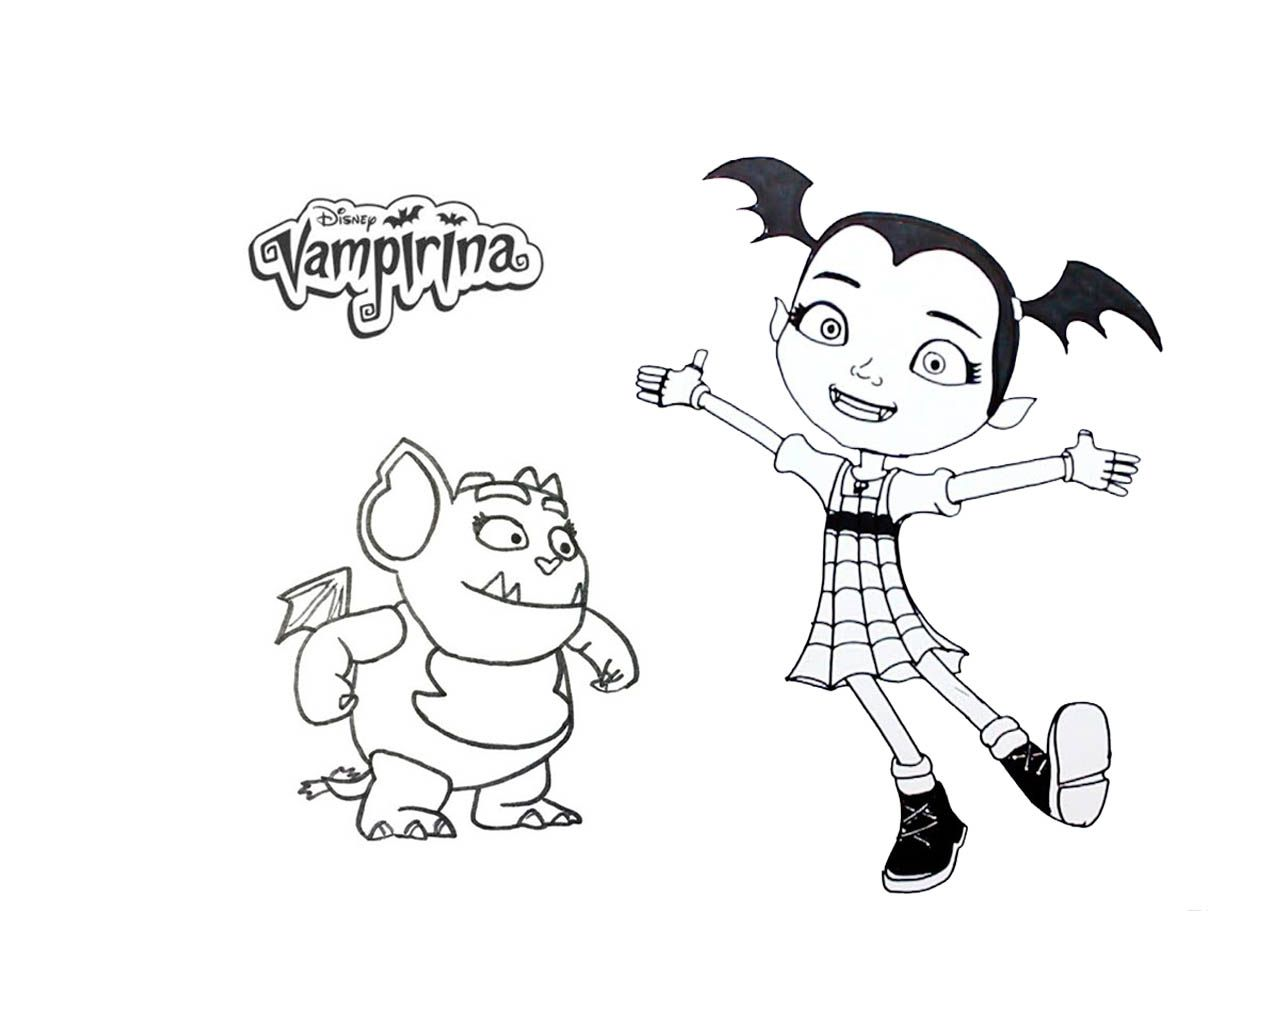 Vampirina Coloring Page 09 Jpg 1 280 1 024 Pixels Disney Embroidery Coloring Pages Halloween Coloring Pages